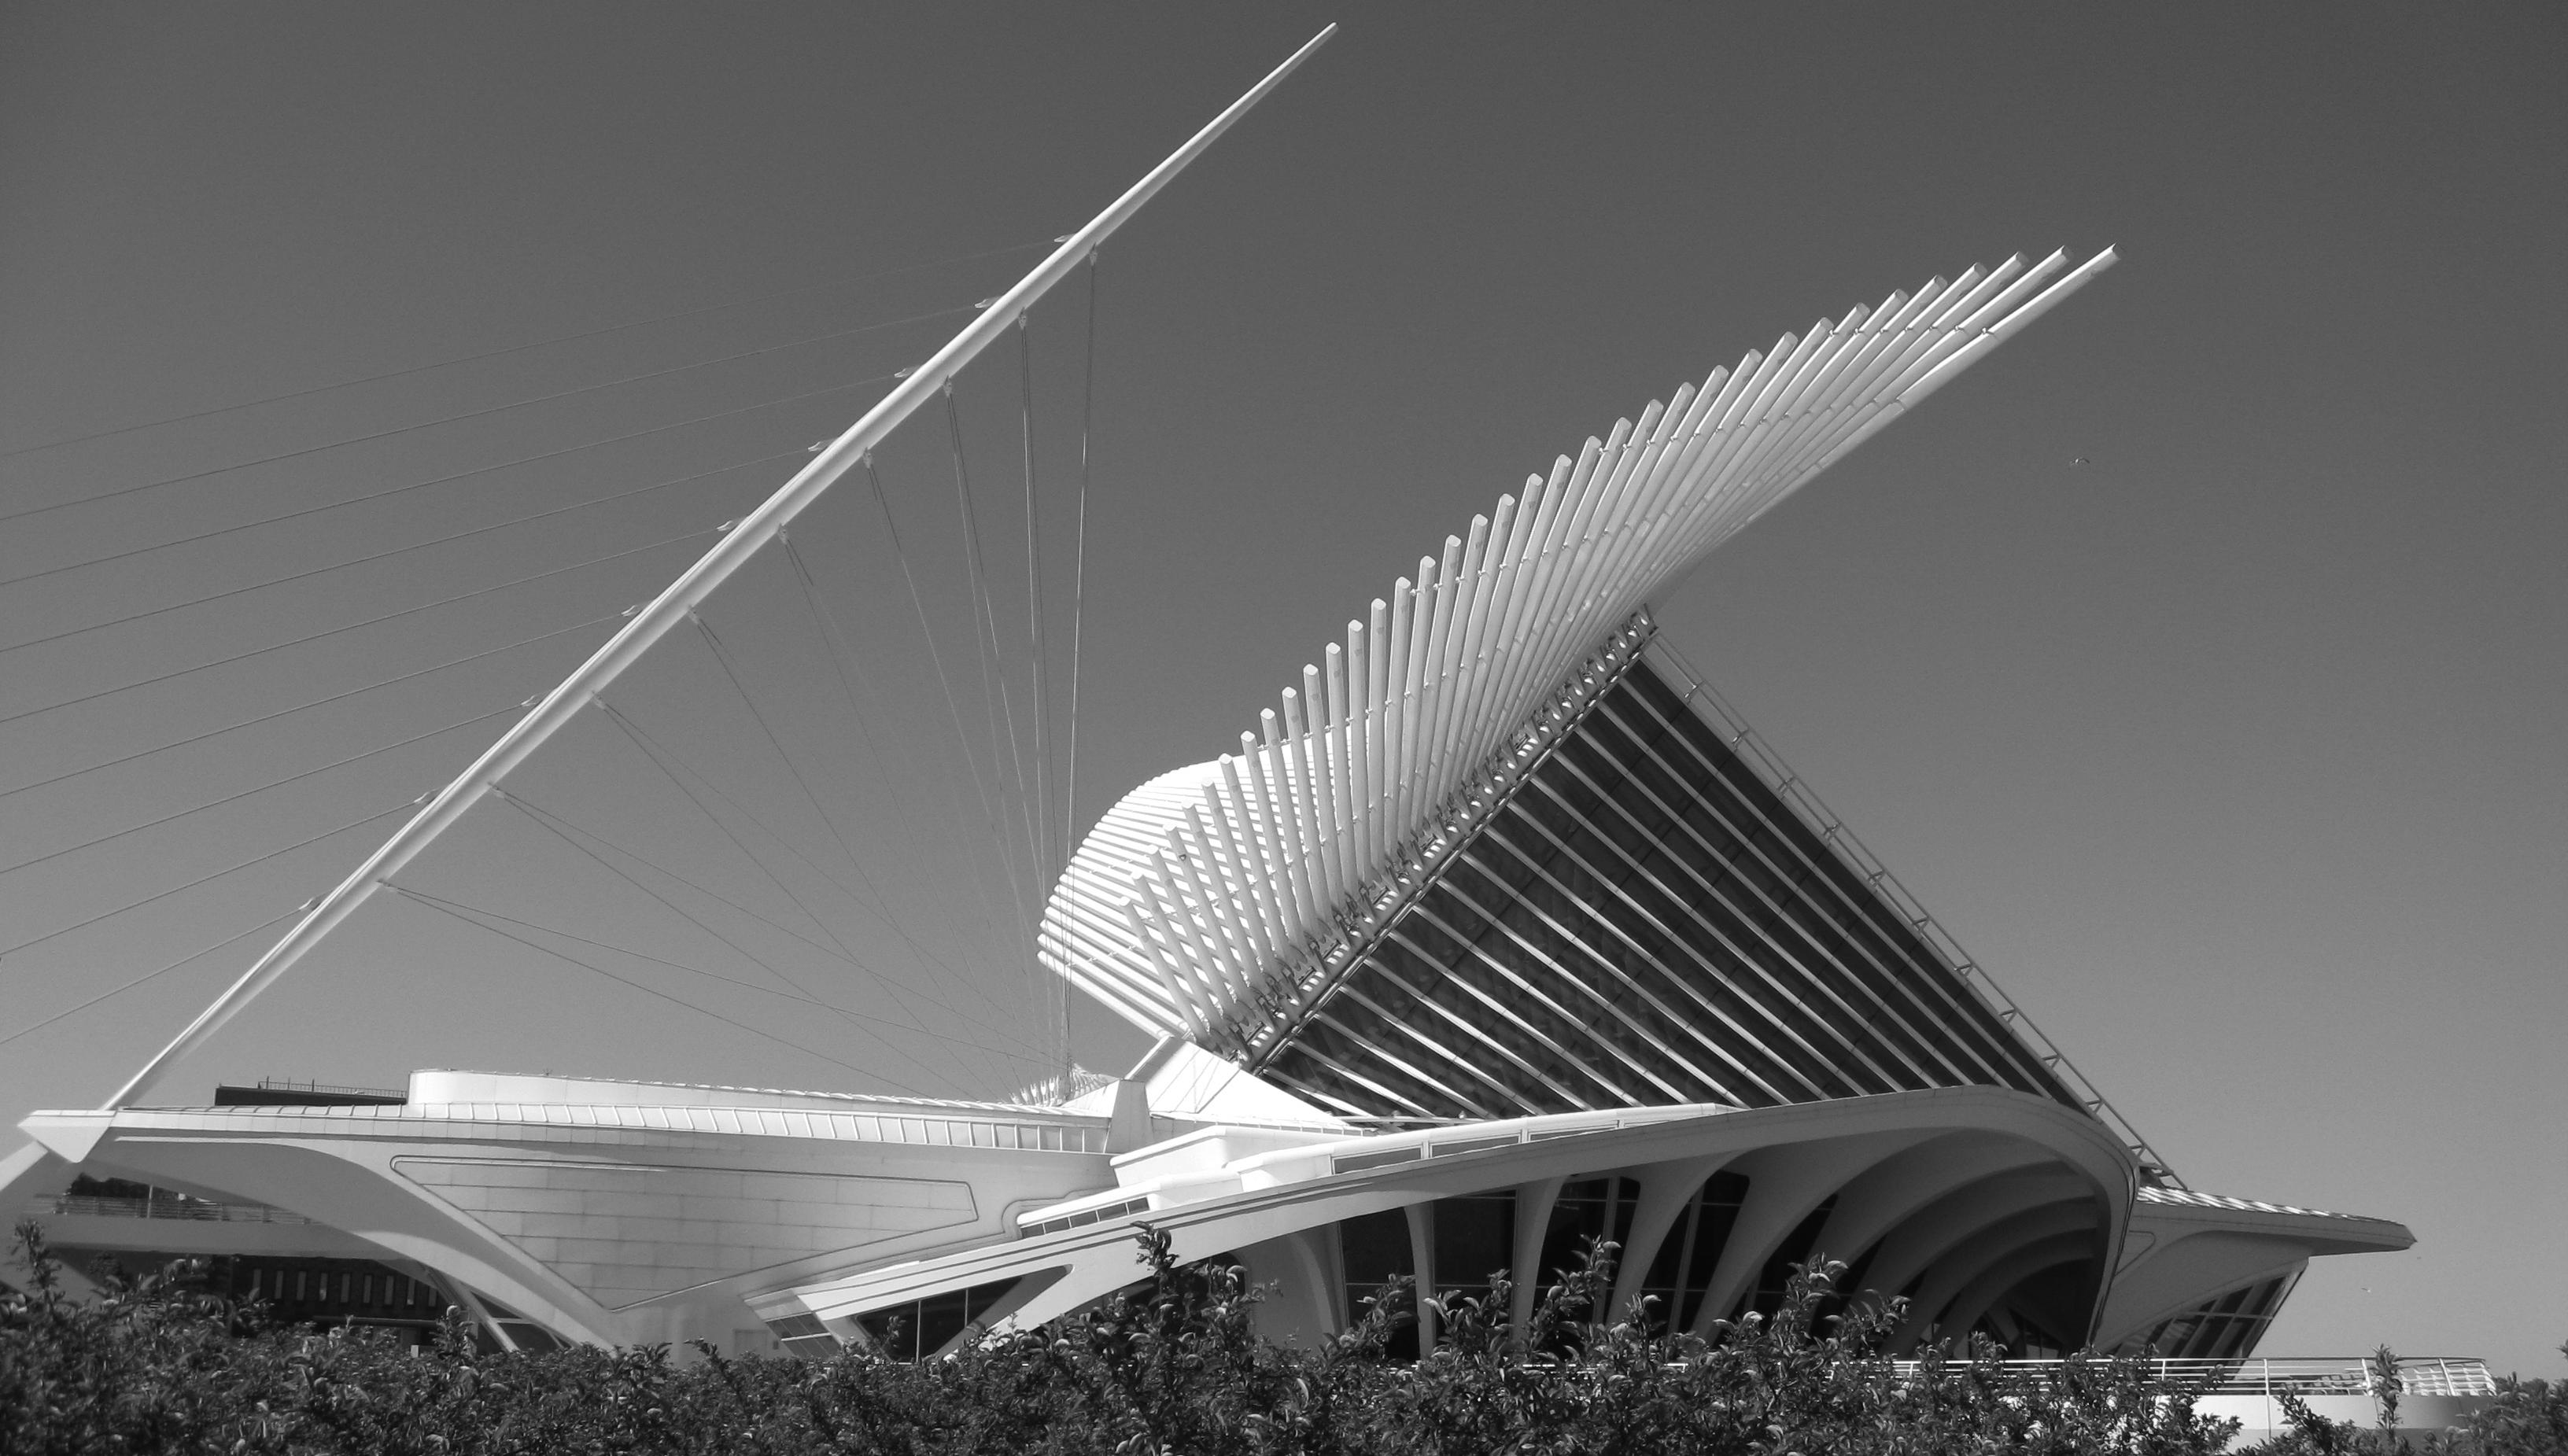 Bmw Museum Tripadvisor >> Milwaukee Art Museum Visit | Autos Post